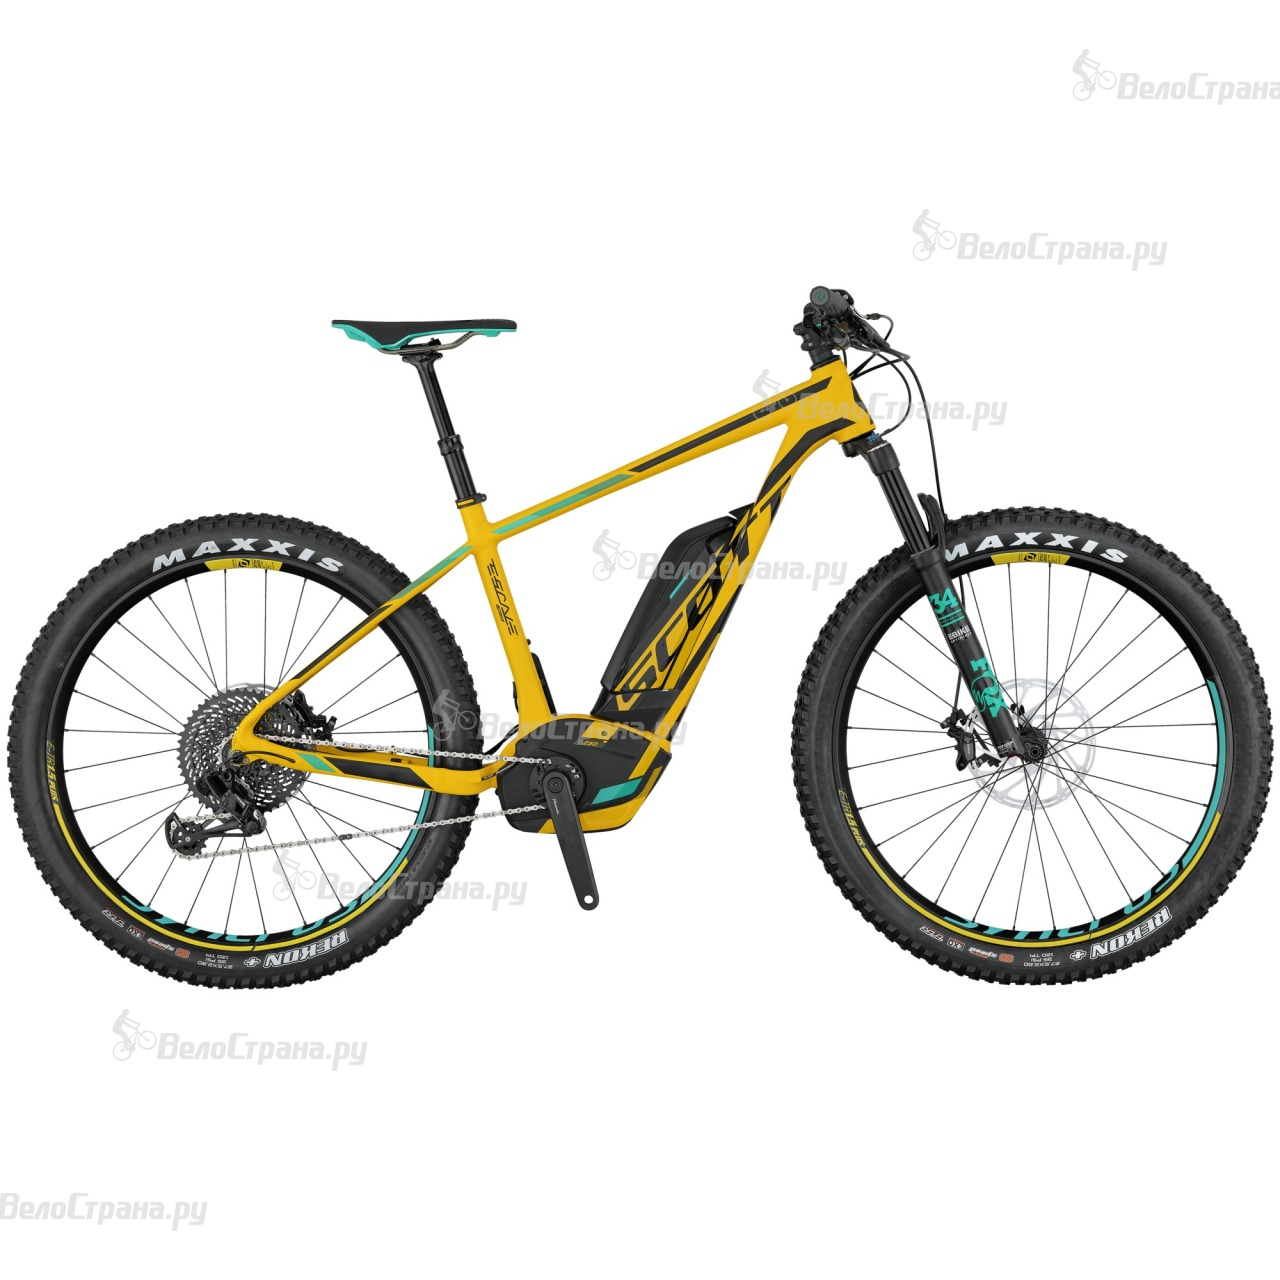 Велосипед Scott E-Scale 700 Plus Ultimate (2017) scott scale 700 rc 2016